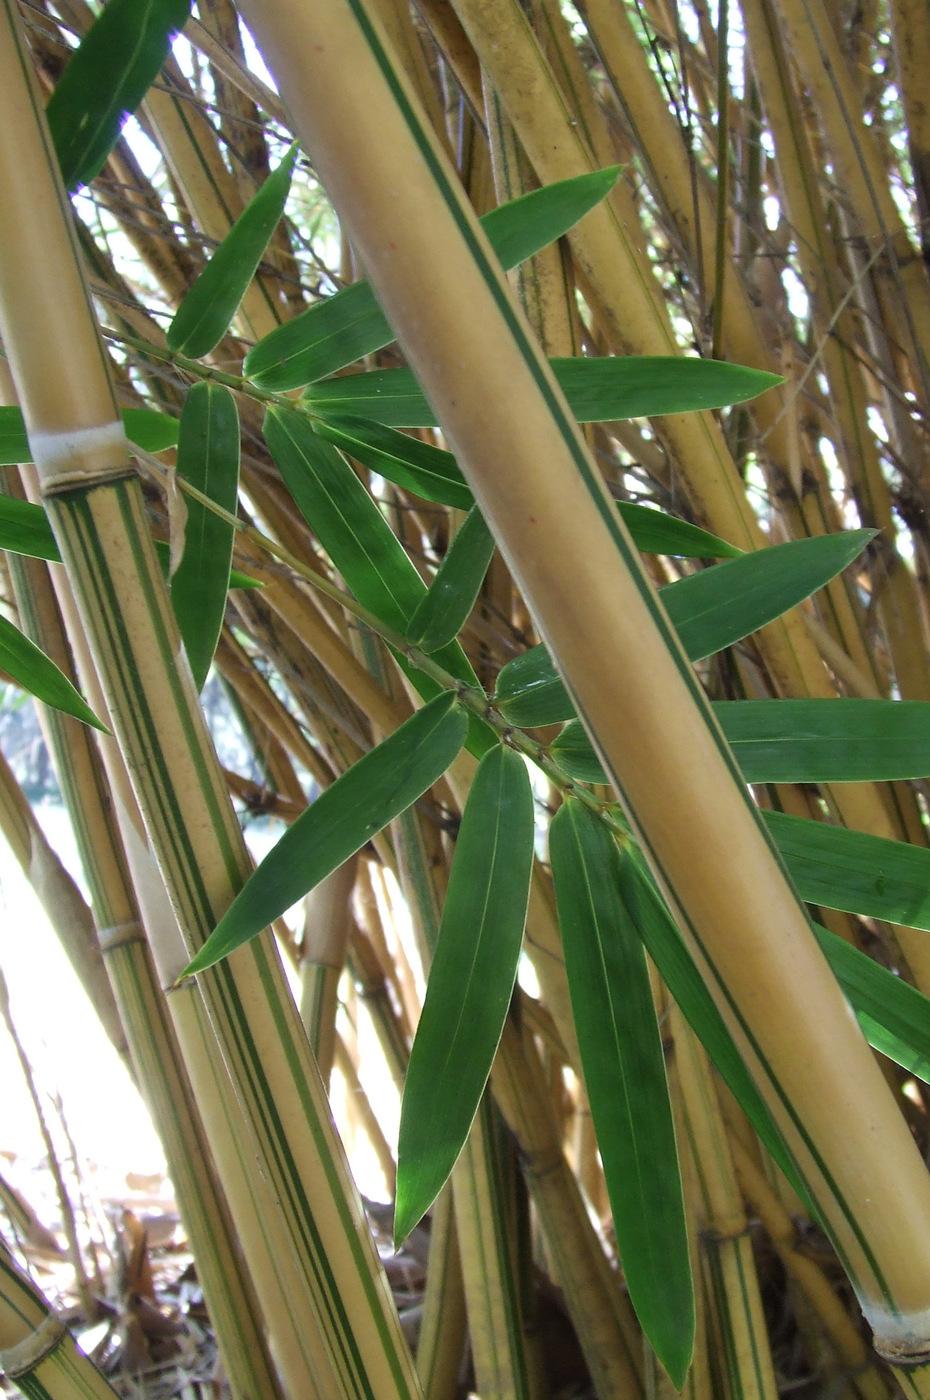 Especial Alphonse Karr Bamboo Land Nursery Qld Australia Bambusa Multiplex Alphonse Karr Bamboo Land Nursery Qld Australia Alphonse Karr Bamboo Wikipedia Alphonse Karr Bamboo Price houzz-02 Alphonse Karr Bamboo